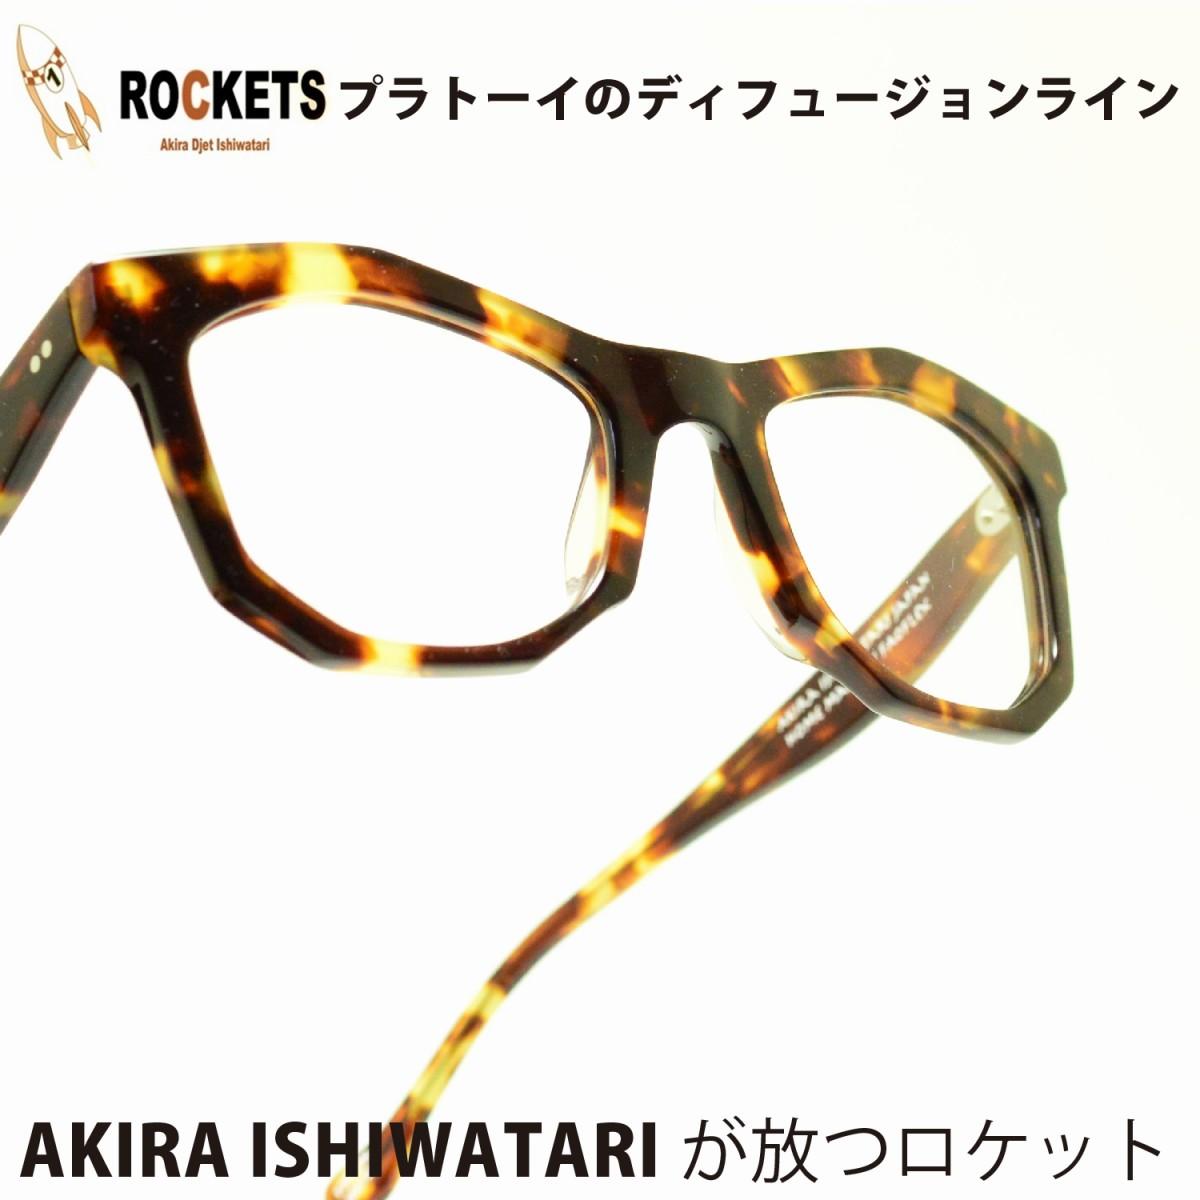 ROCKETS UTSUKE COL-FAULINメガネ 眼鏡 めがね メンズ レディース おしゃれ ブランド 人気 おすすめ フレーム 流行り 度付き レンズ